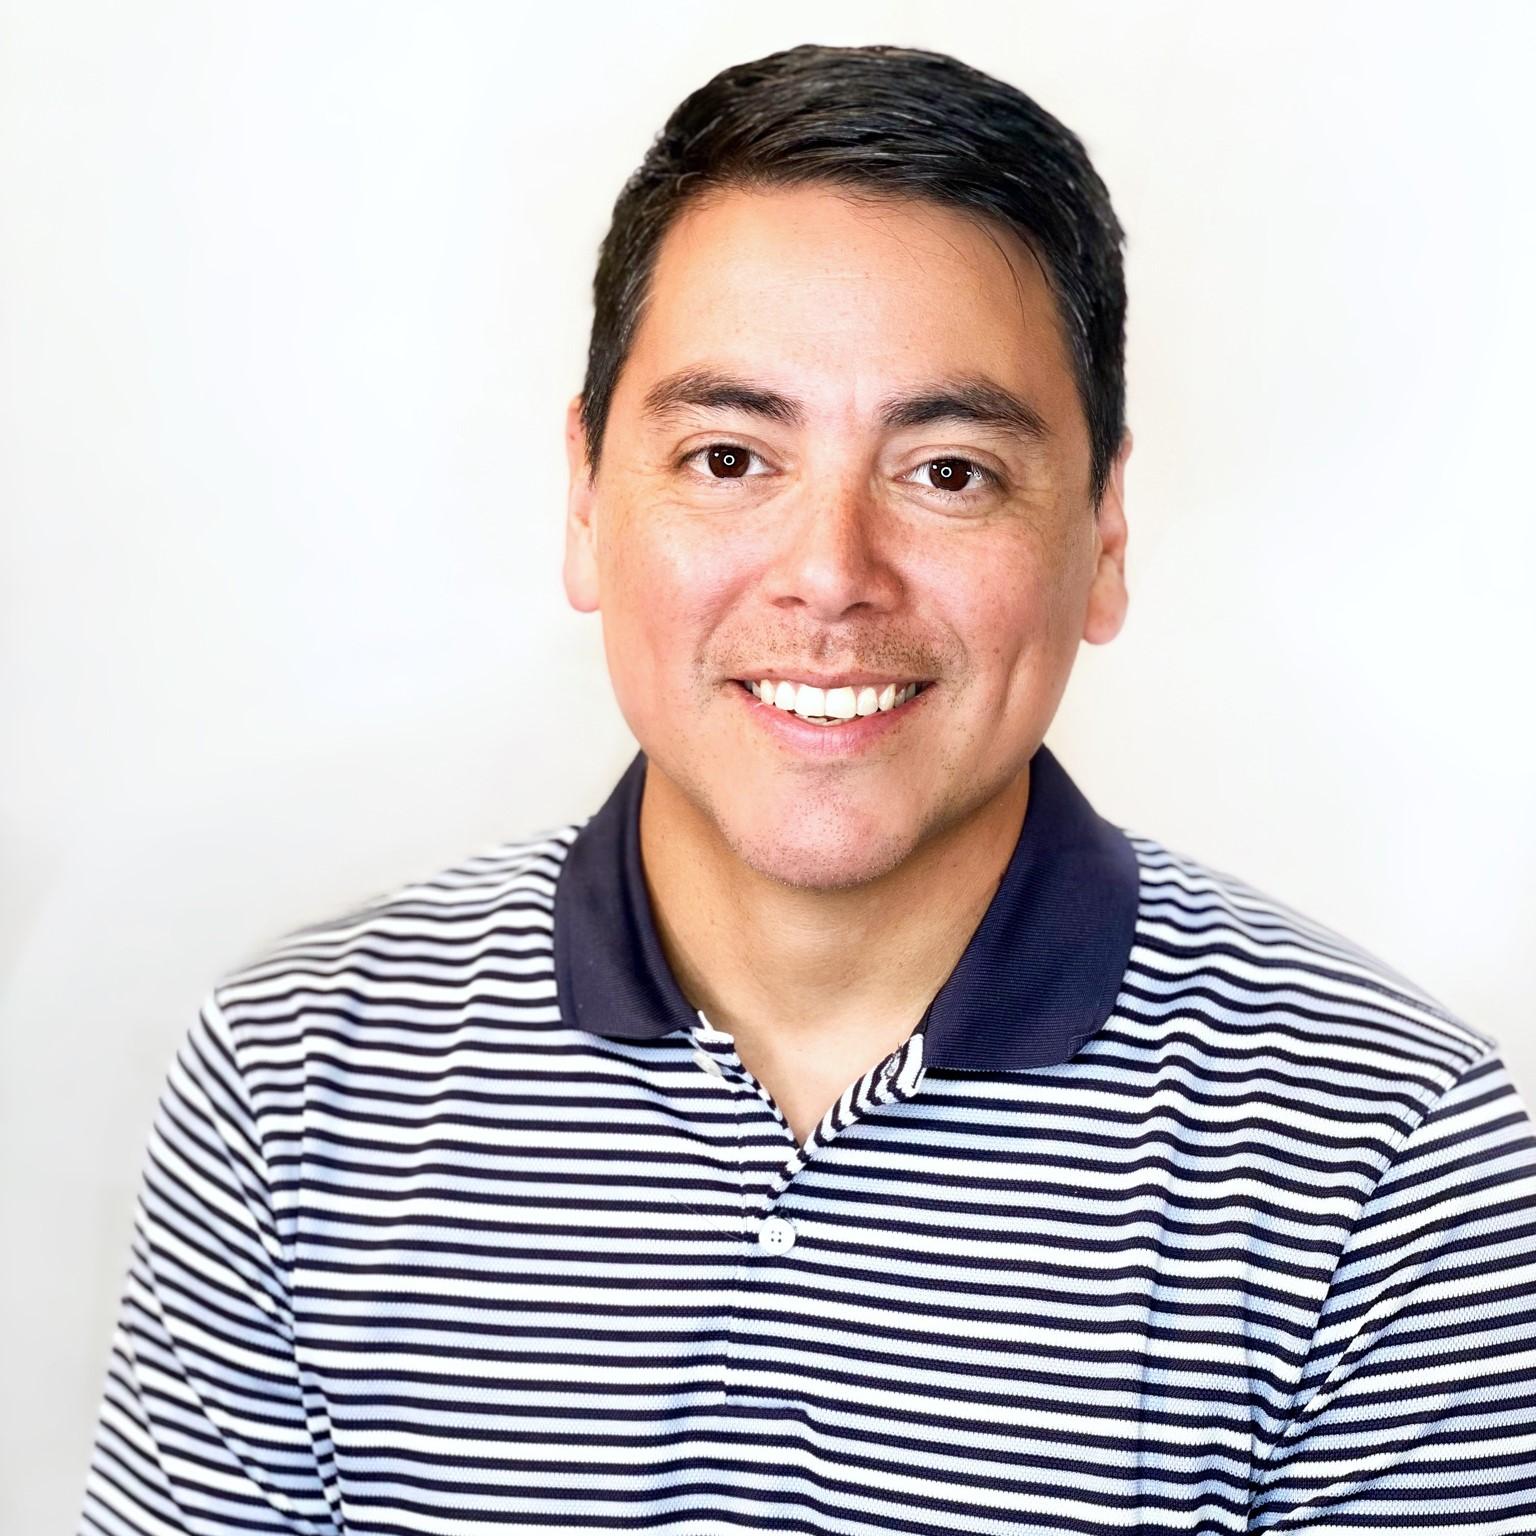 Nate Castaneda